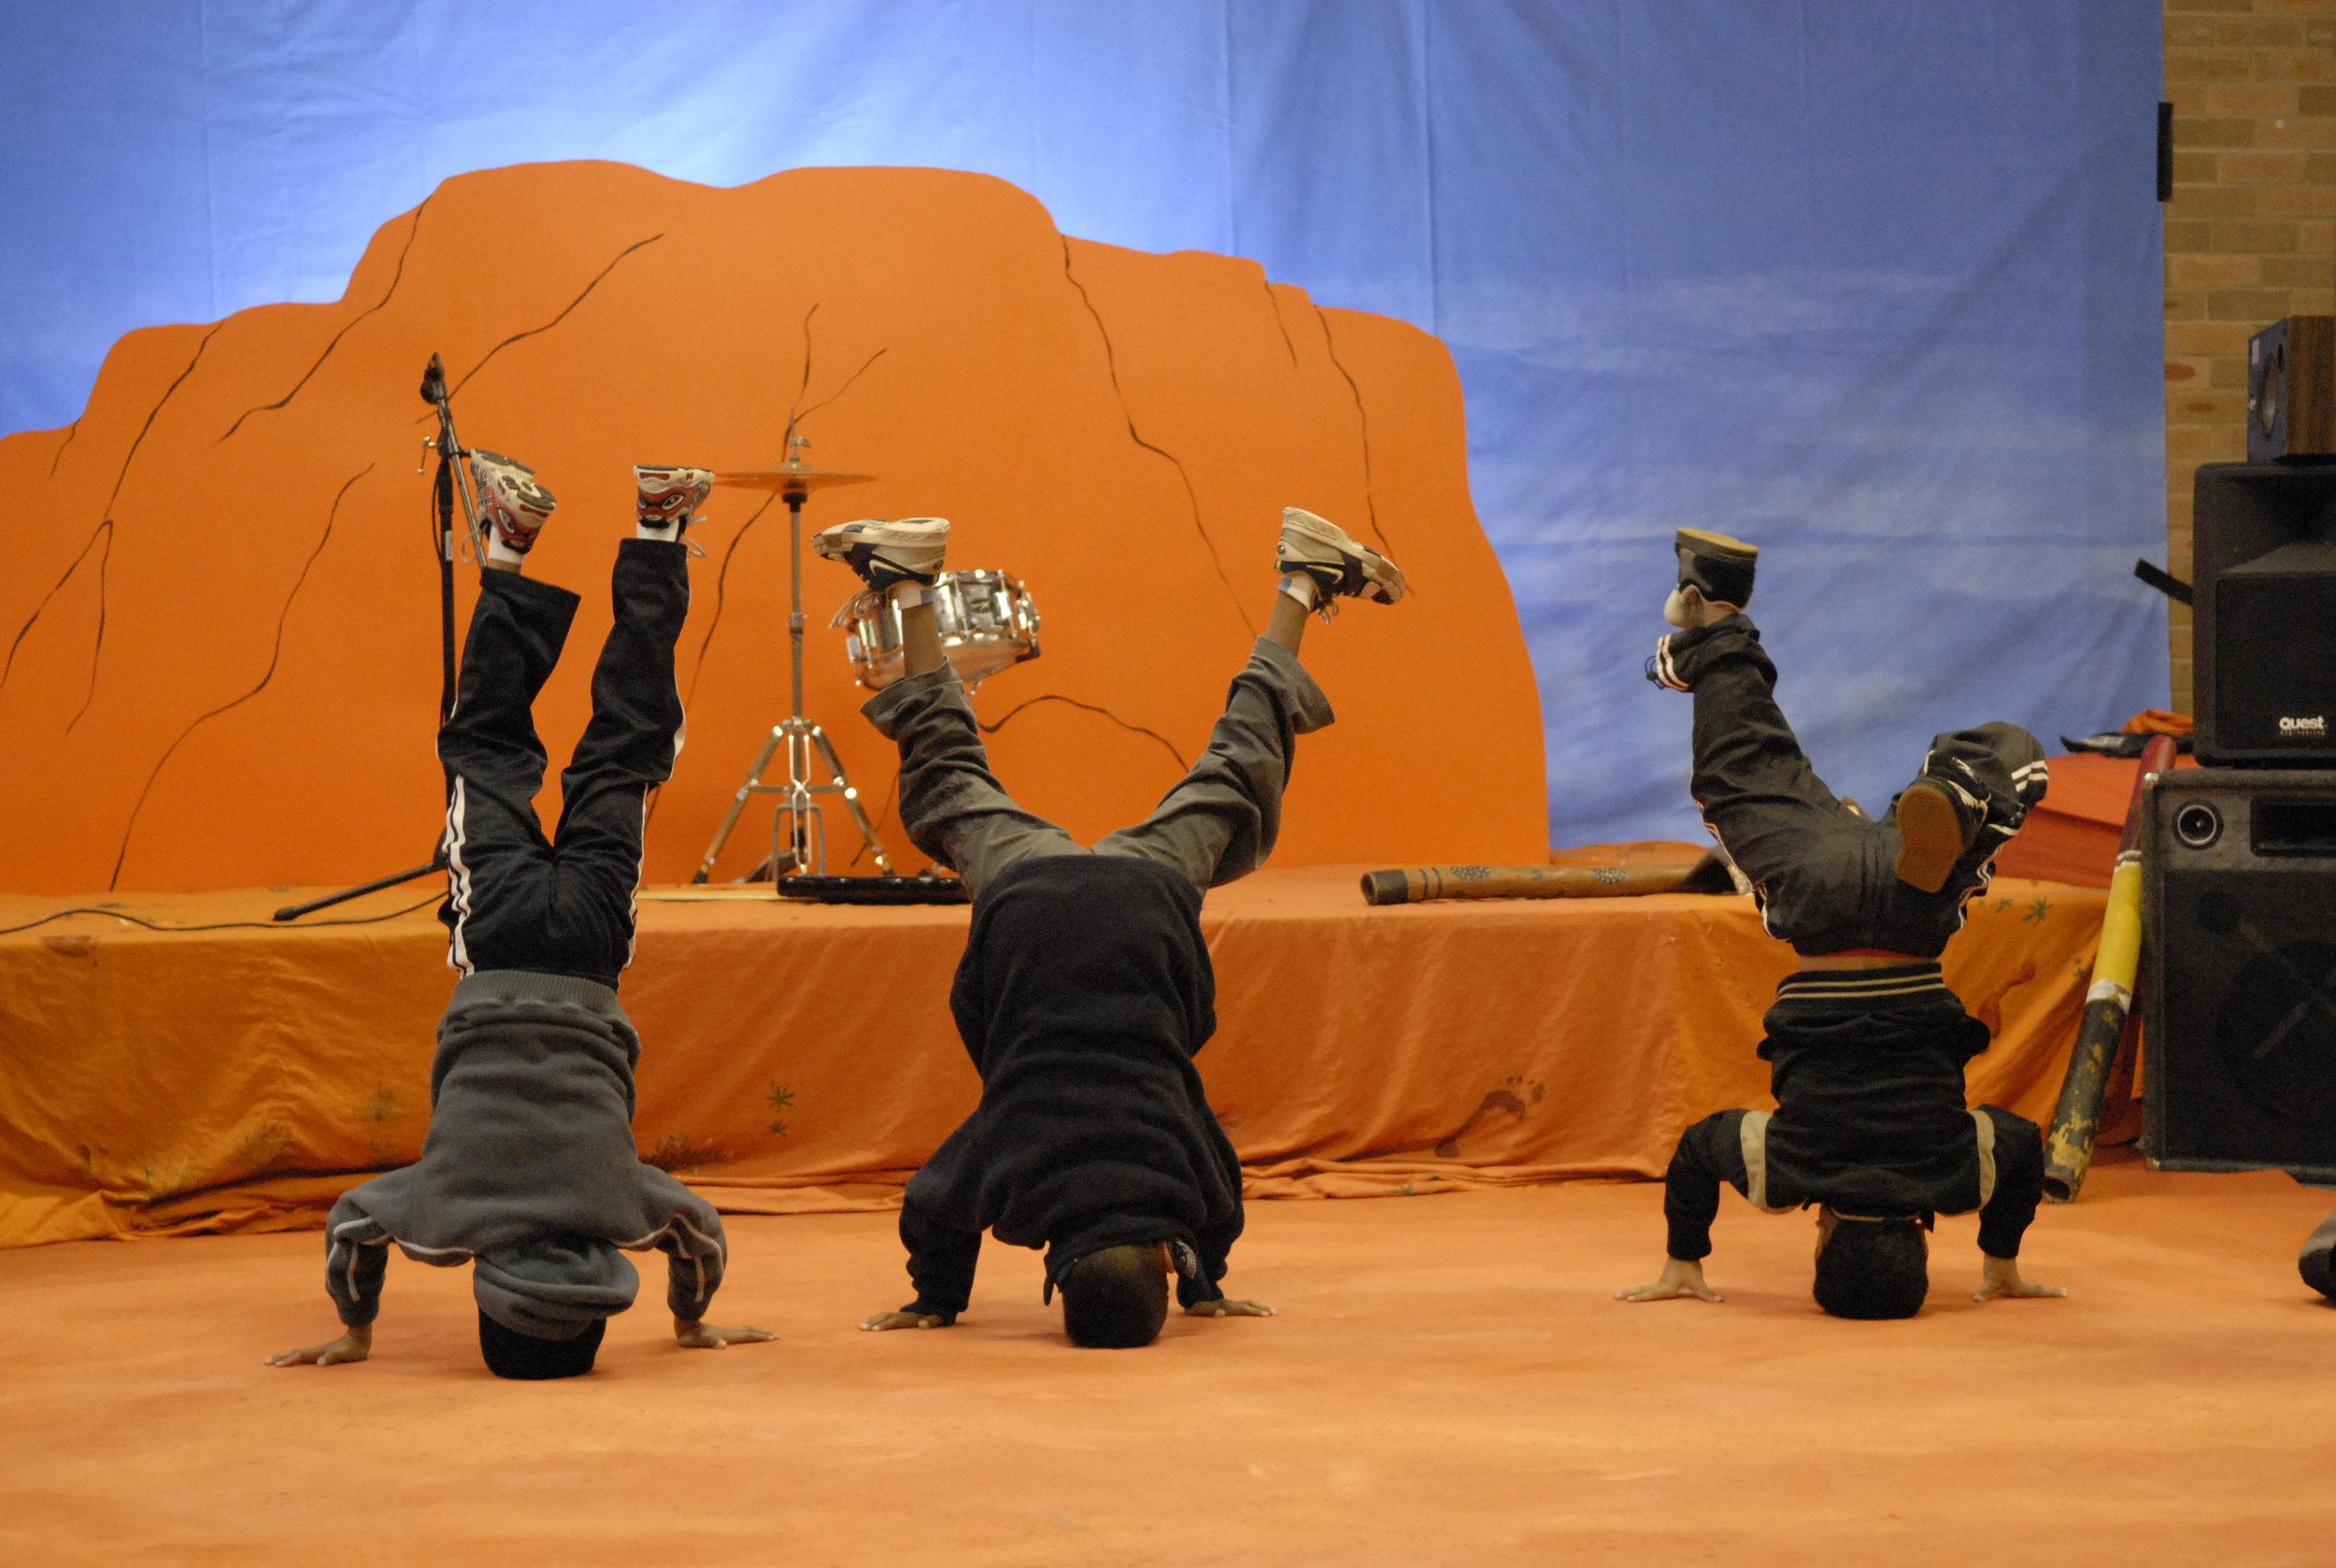 Aboriginal boys and fun in front of Uluru prop for the Kangaroo Rock clip